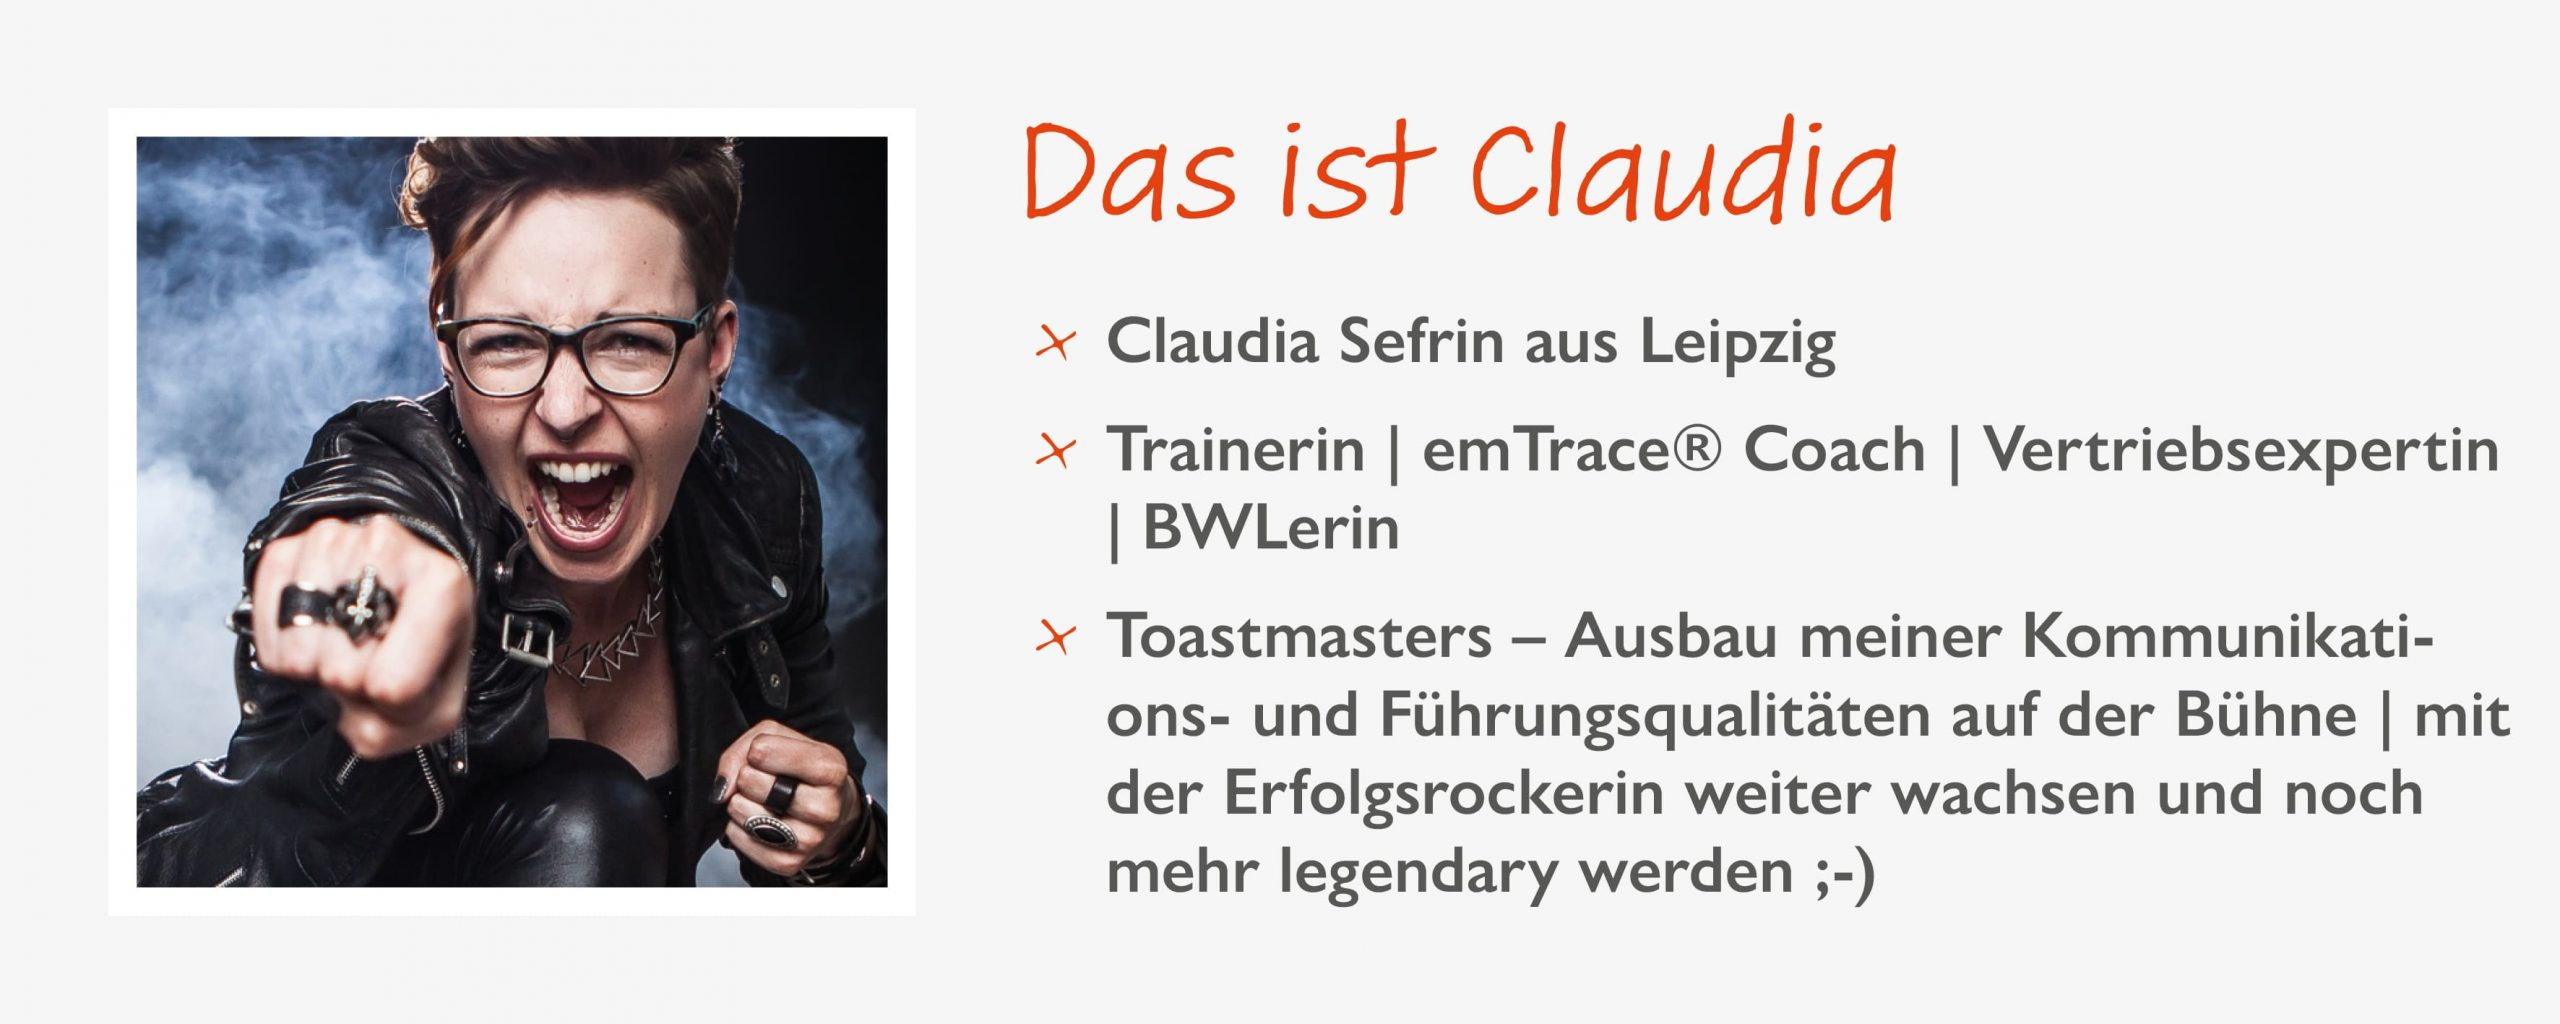 Erfolgsrockerin & Motivationscoach Claudia Sefrin